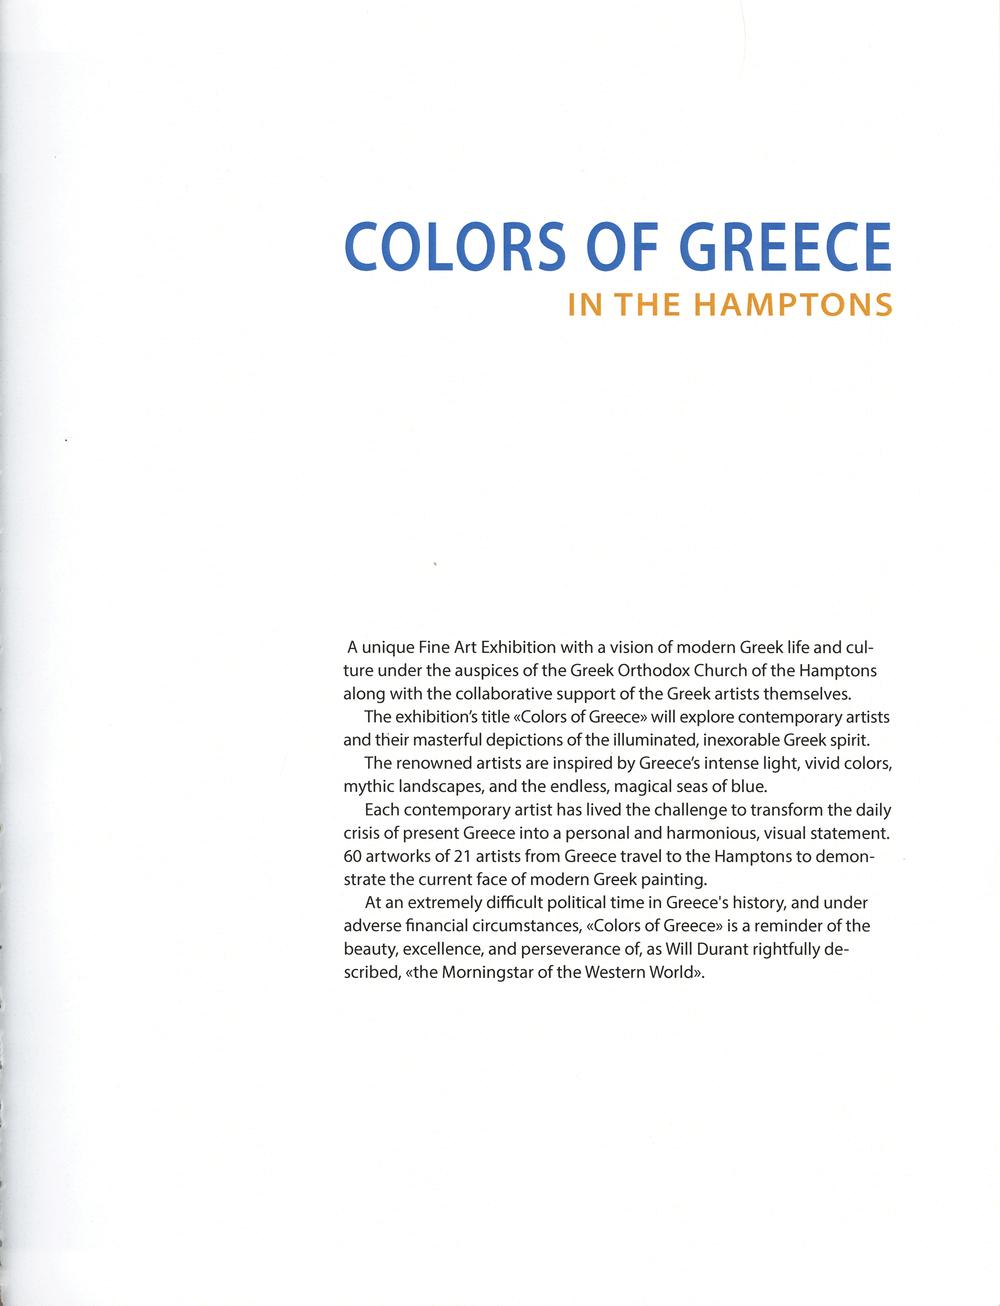 Color-of-Greece-in-The-Hamptons-01.jpg